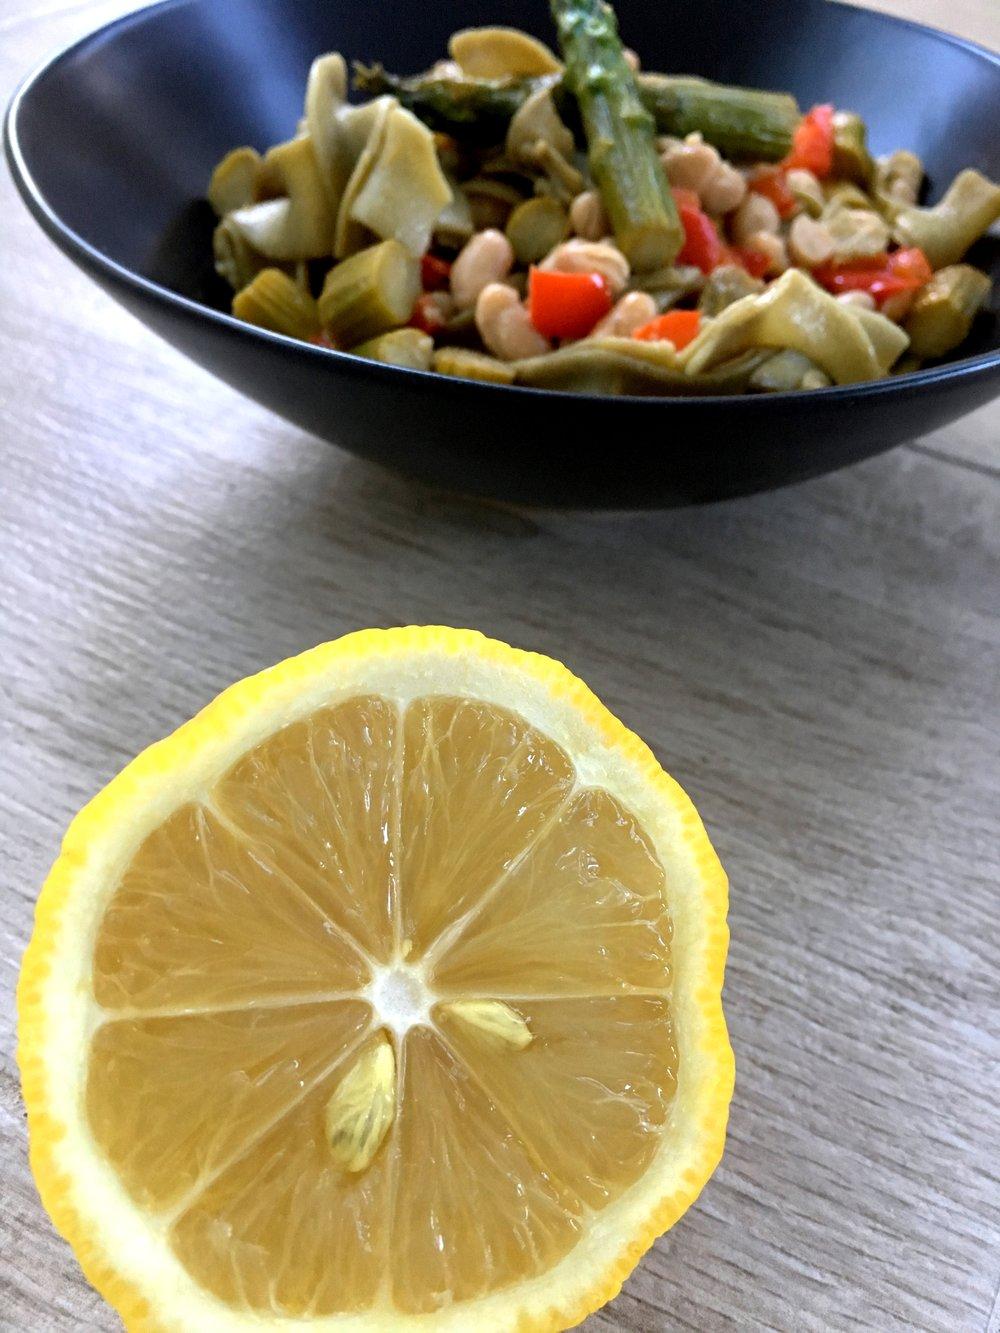 Vegan gluten-free pasta